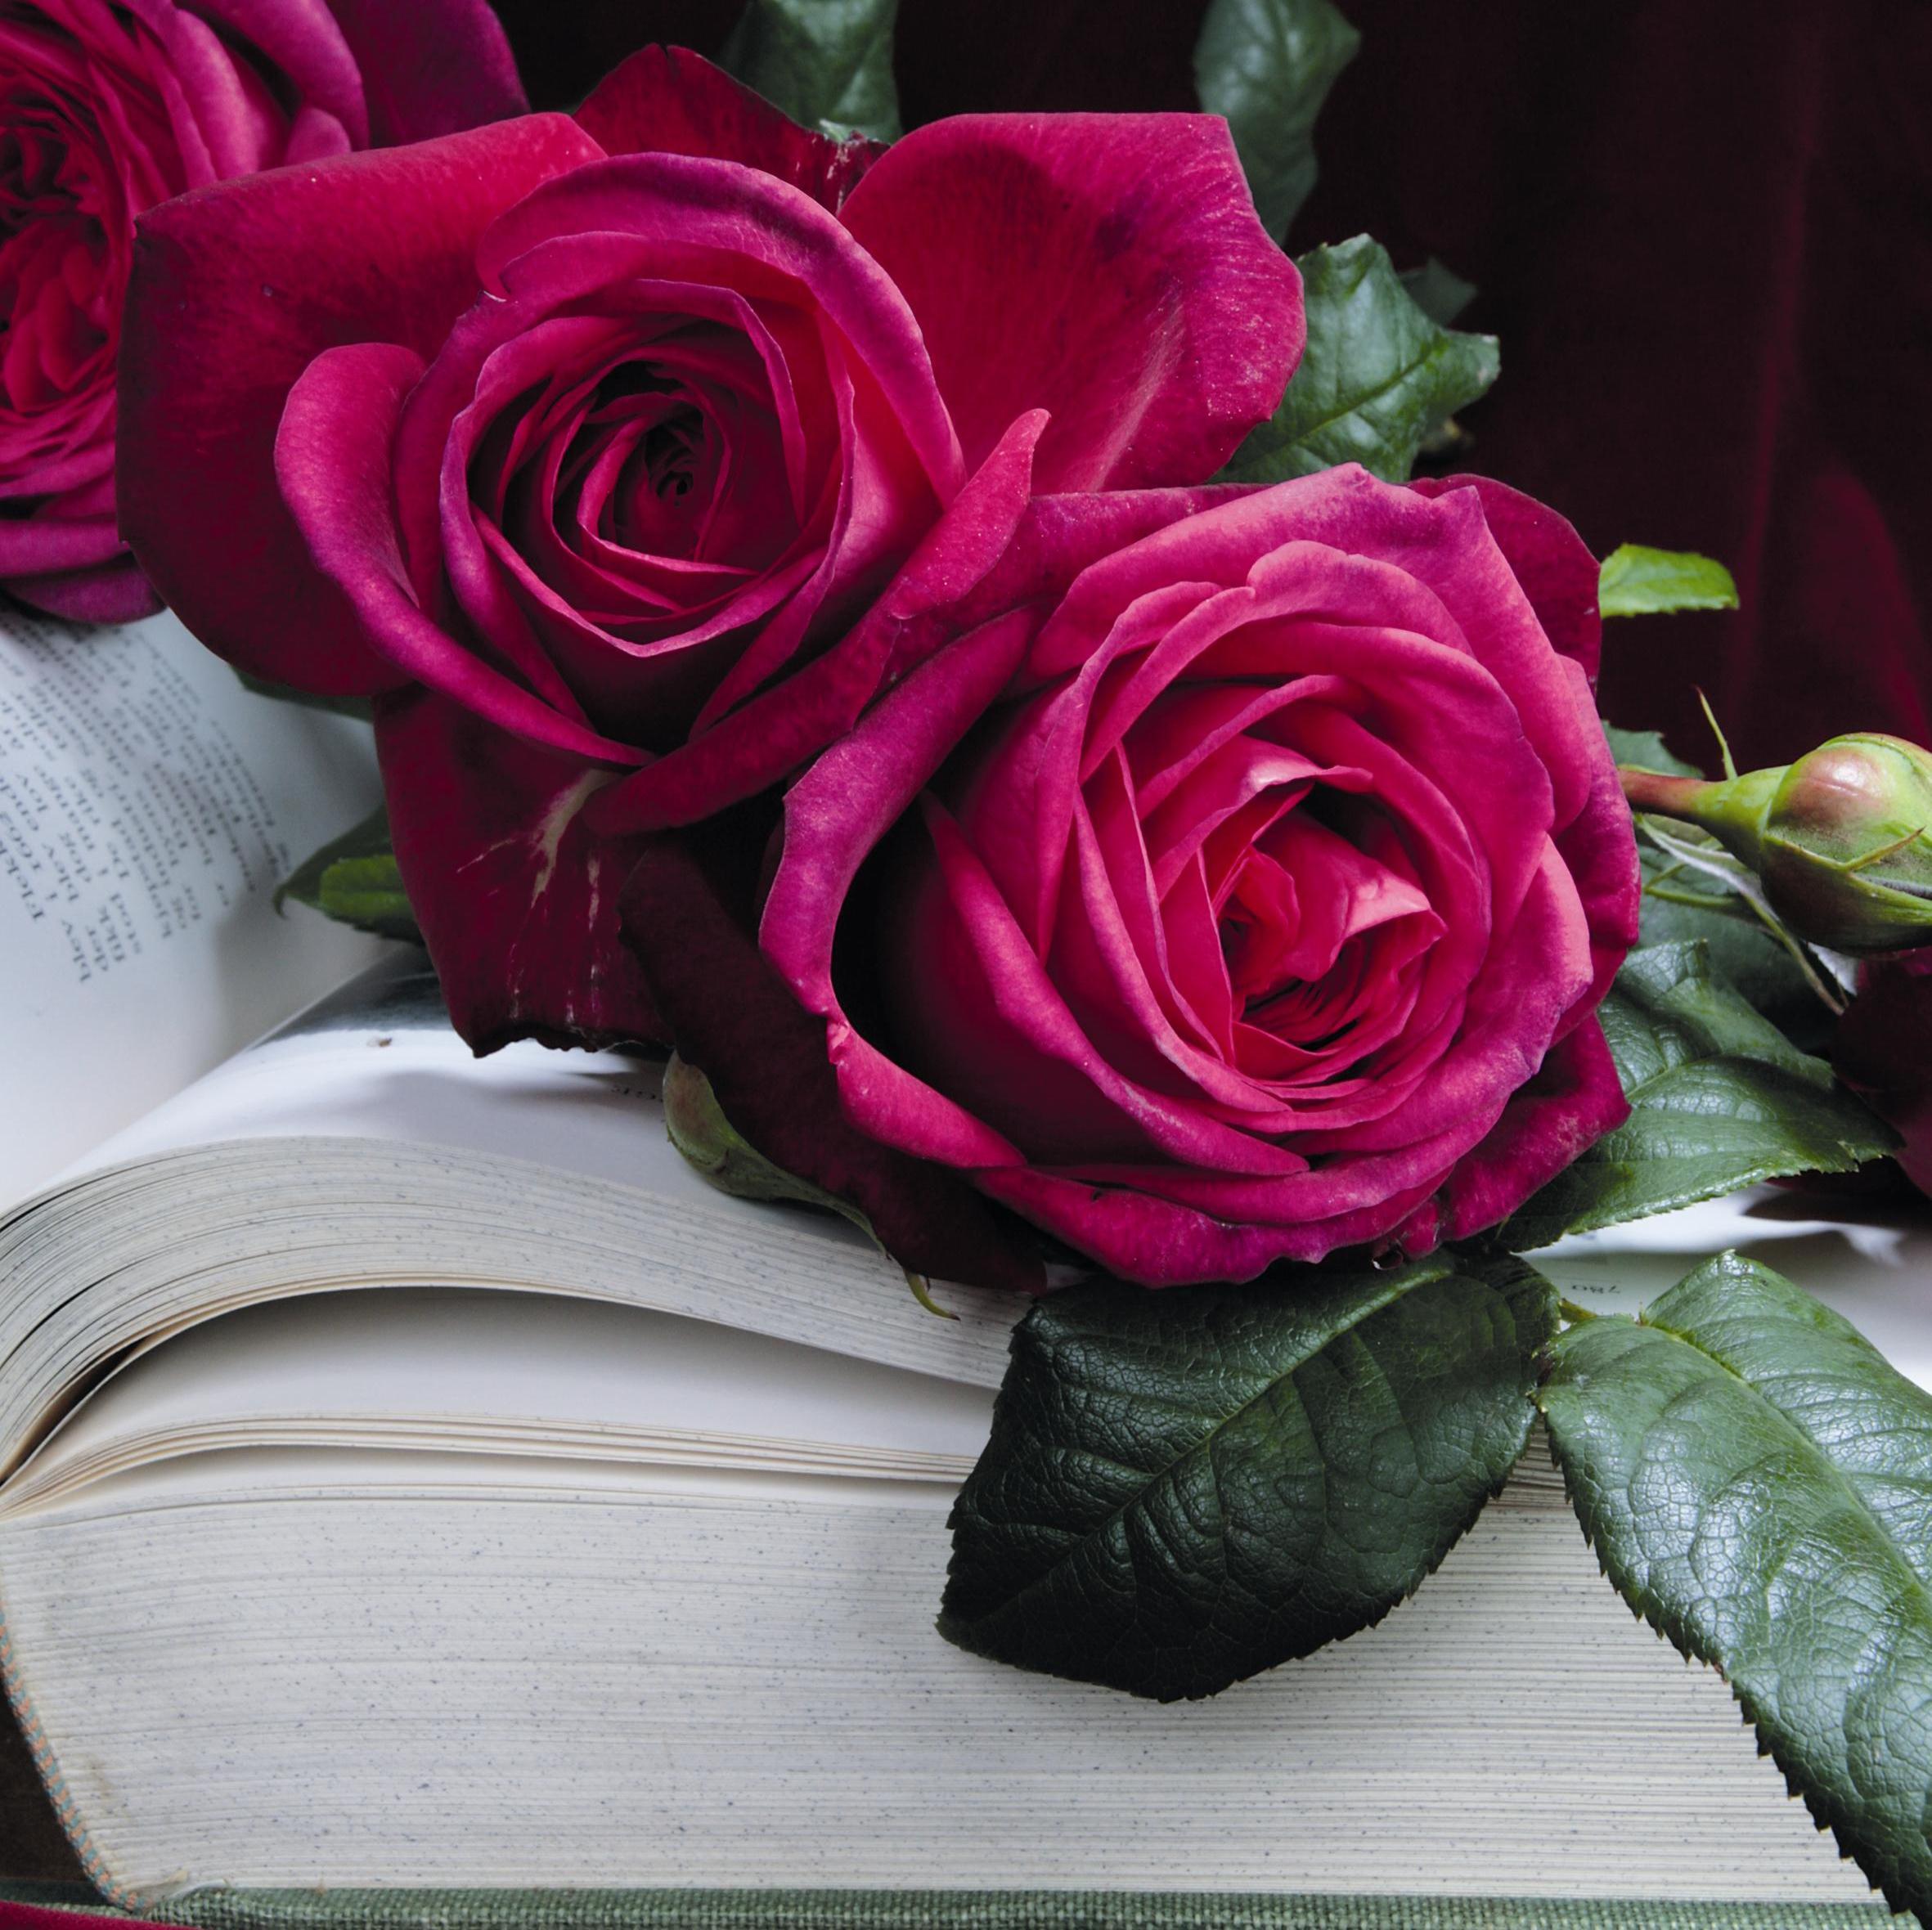 j w von goethe rose online kaufen rosen tantau. Black Bedroom Furniture Sets. Home Design Ideas